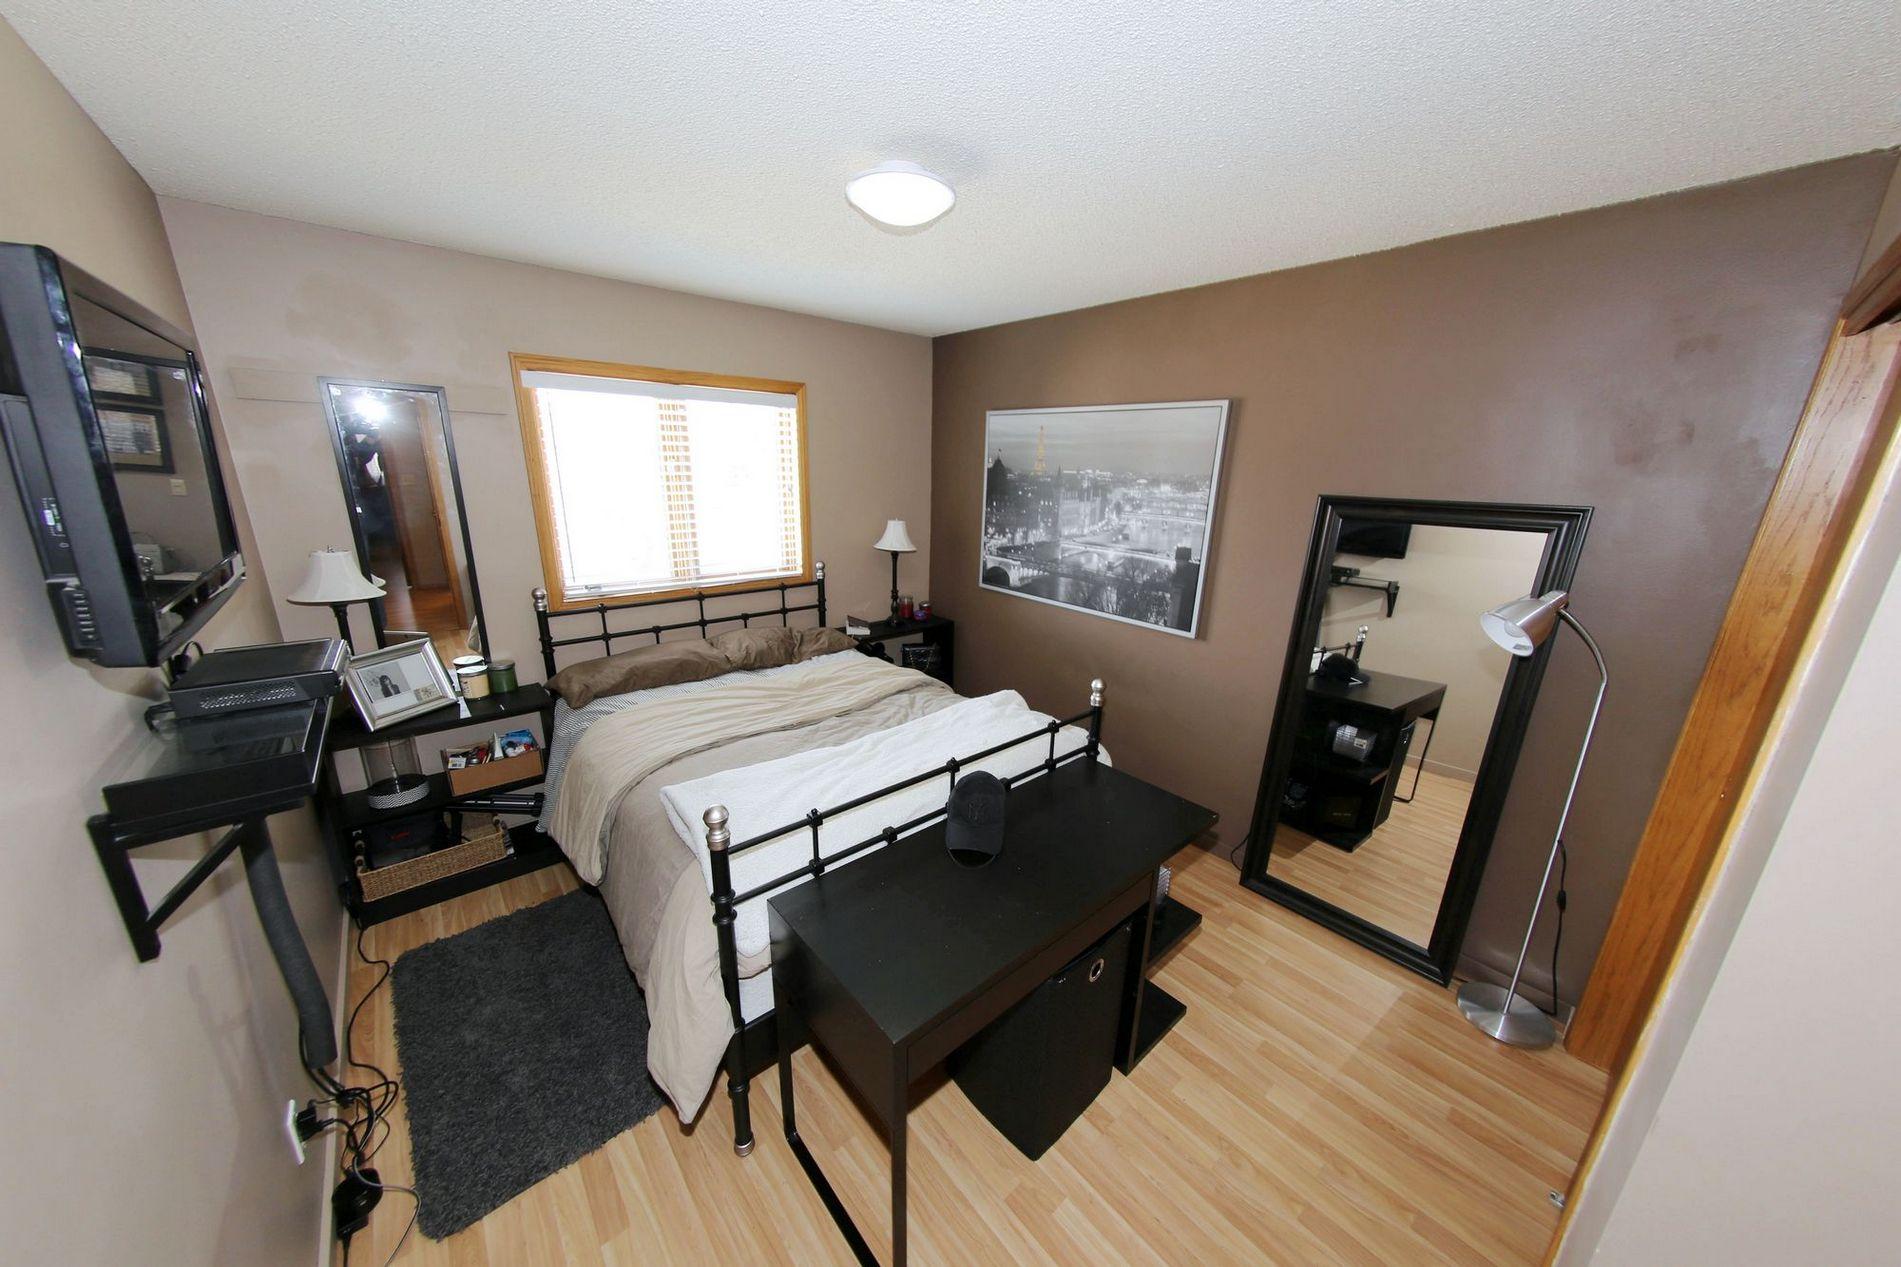 123 Hunterspoint Road, Winnipeg, Manitoba  R3R 3B6 - Photo 19 - 1707500